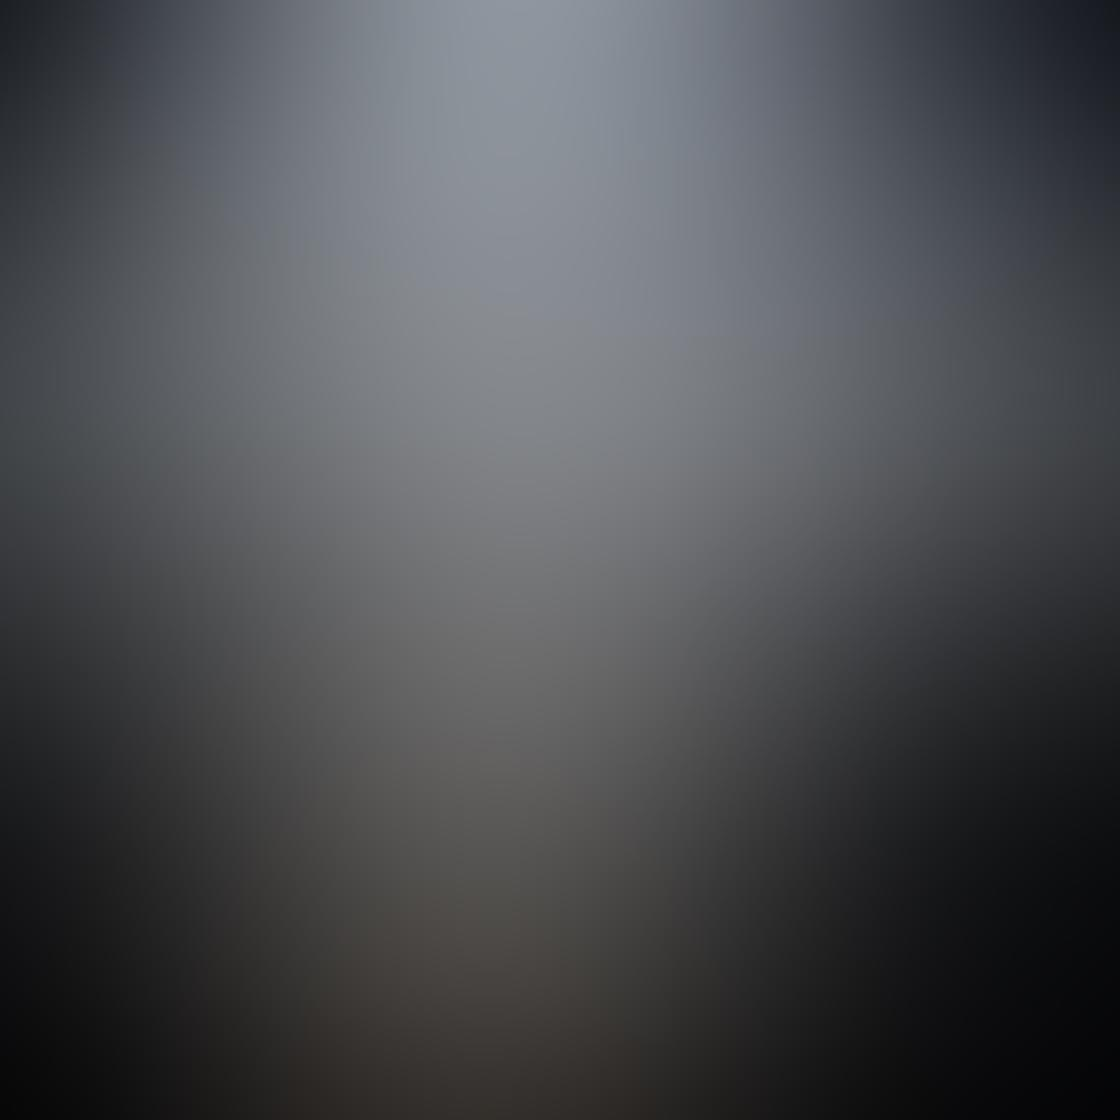 iPhone Sun Photo 04